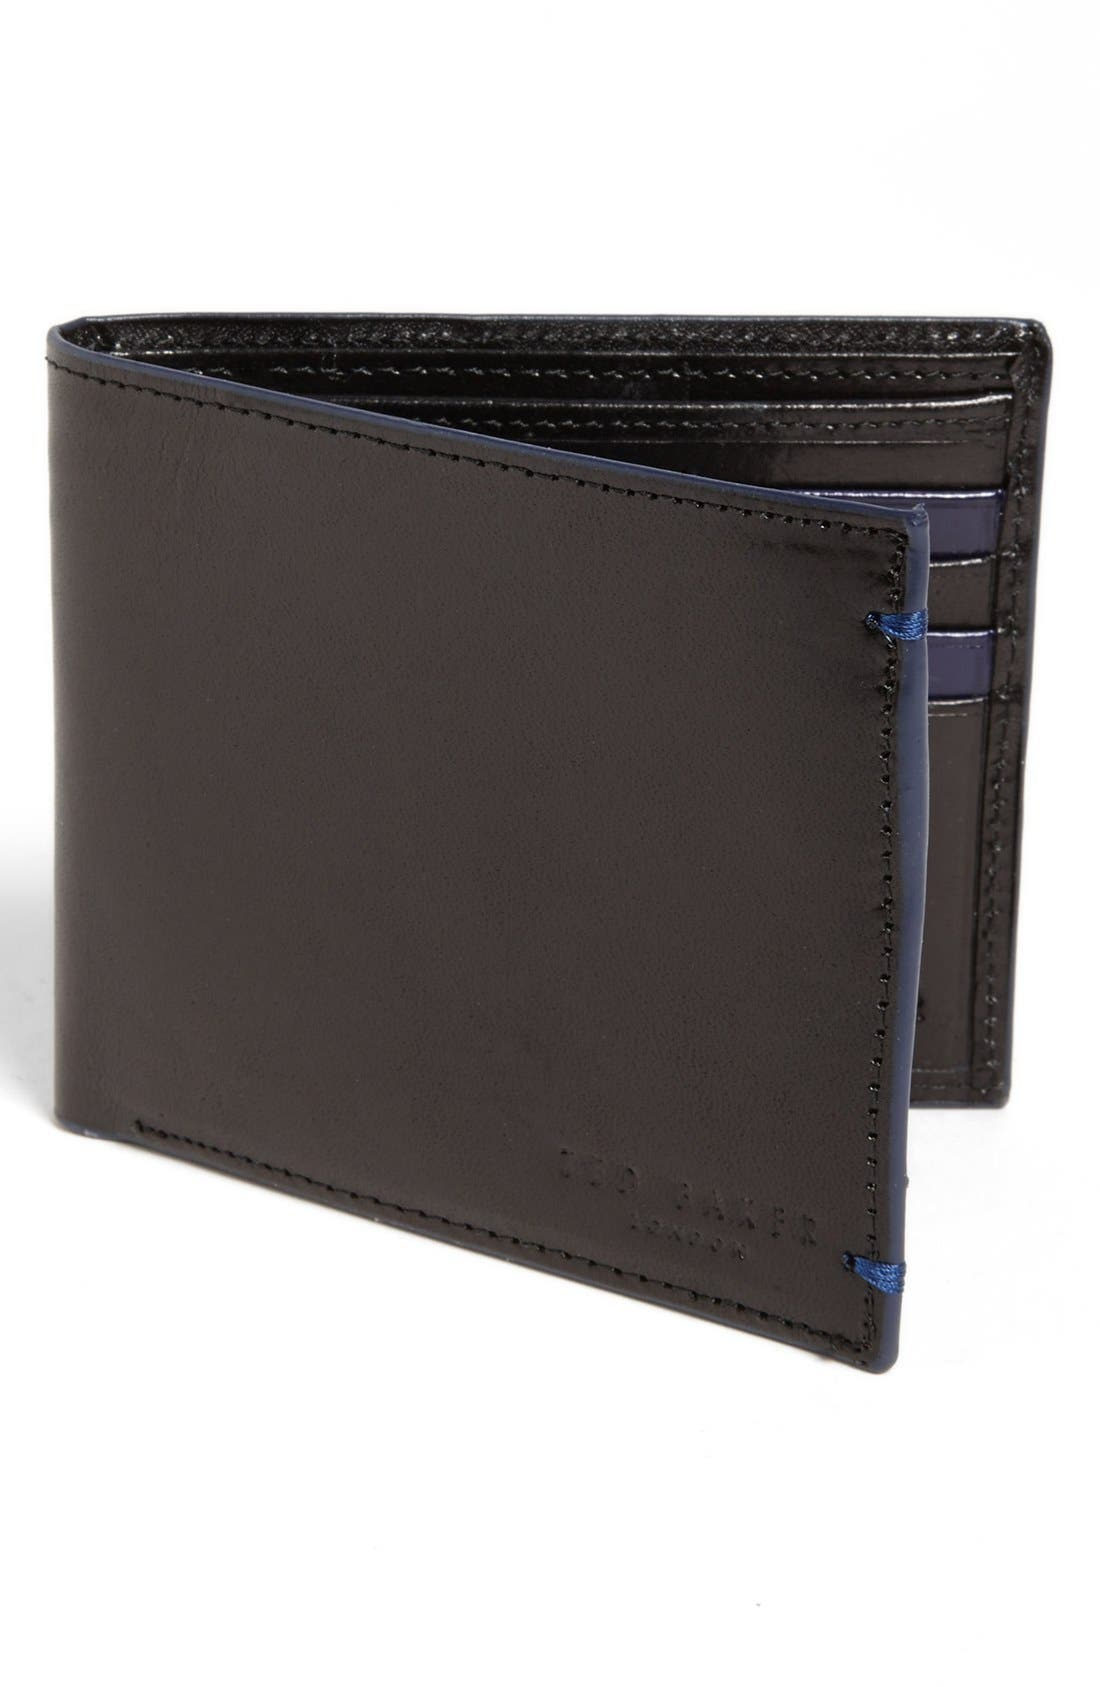 Main Image - Ted Baker London 'Claudis' Wallet